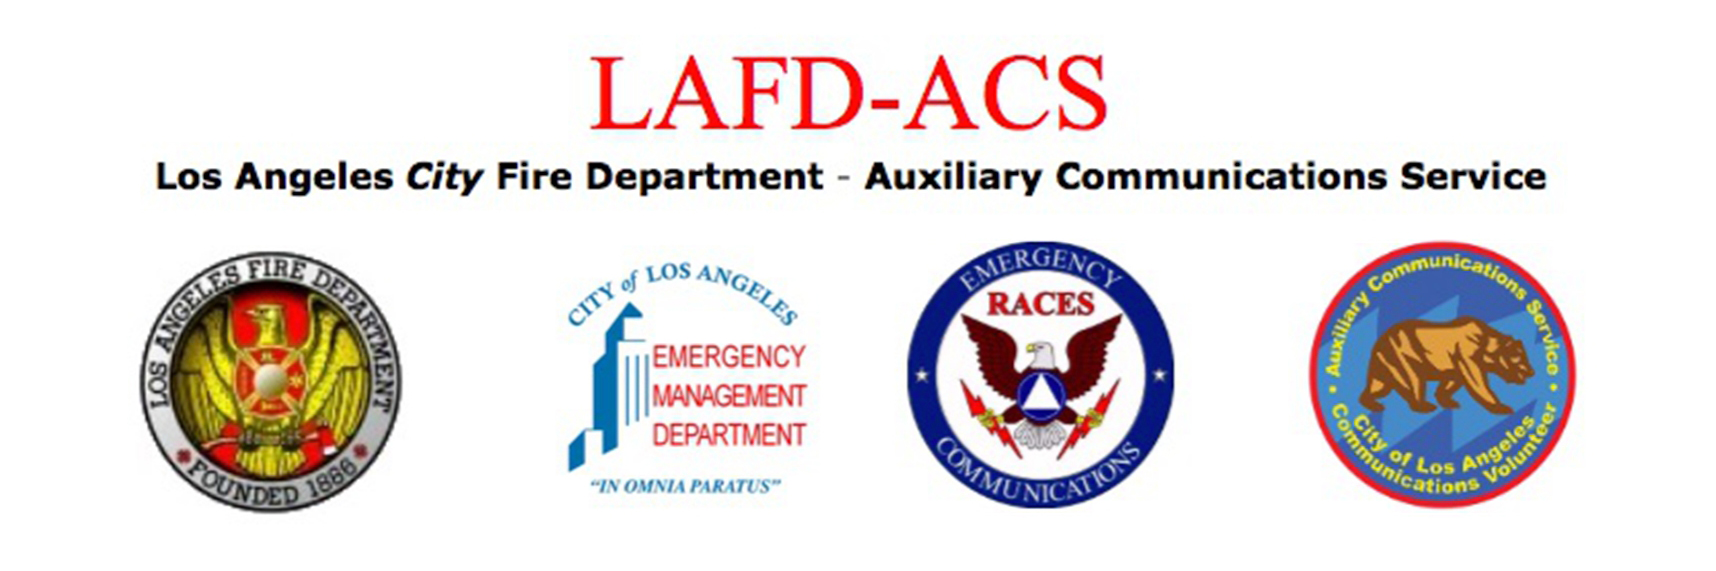 LAFD ACS Banner for web.jpg